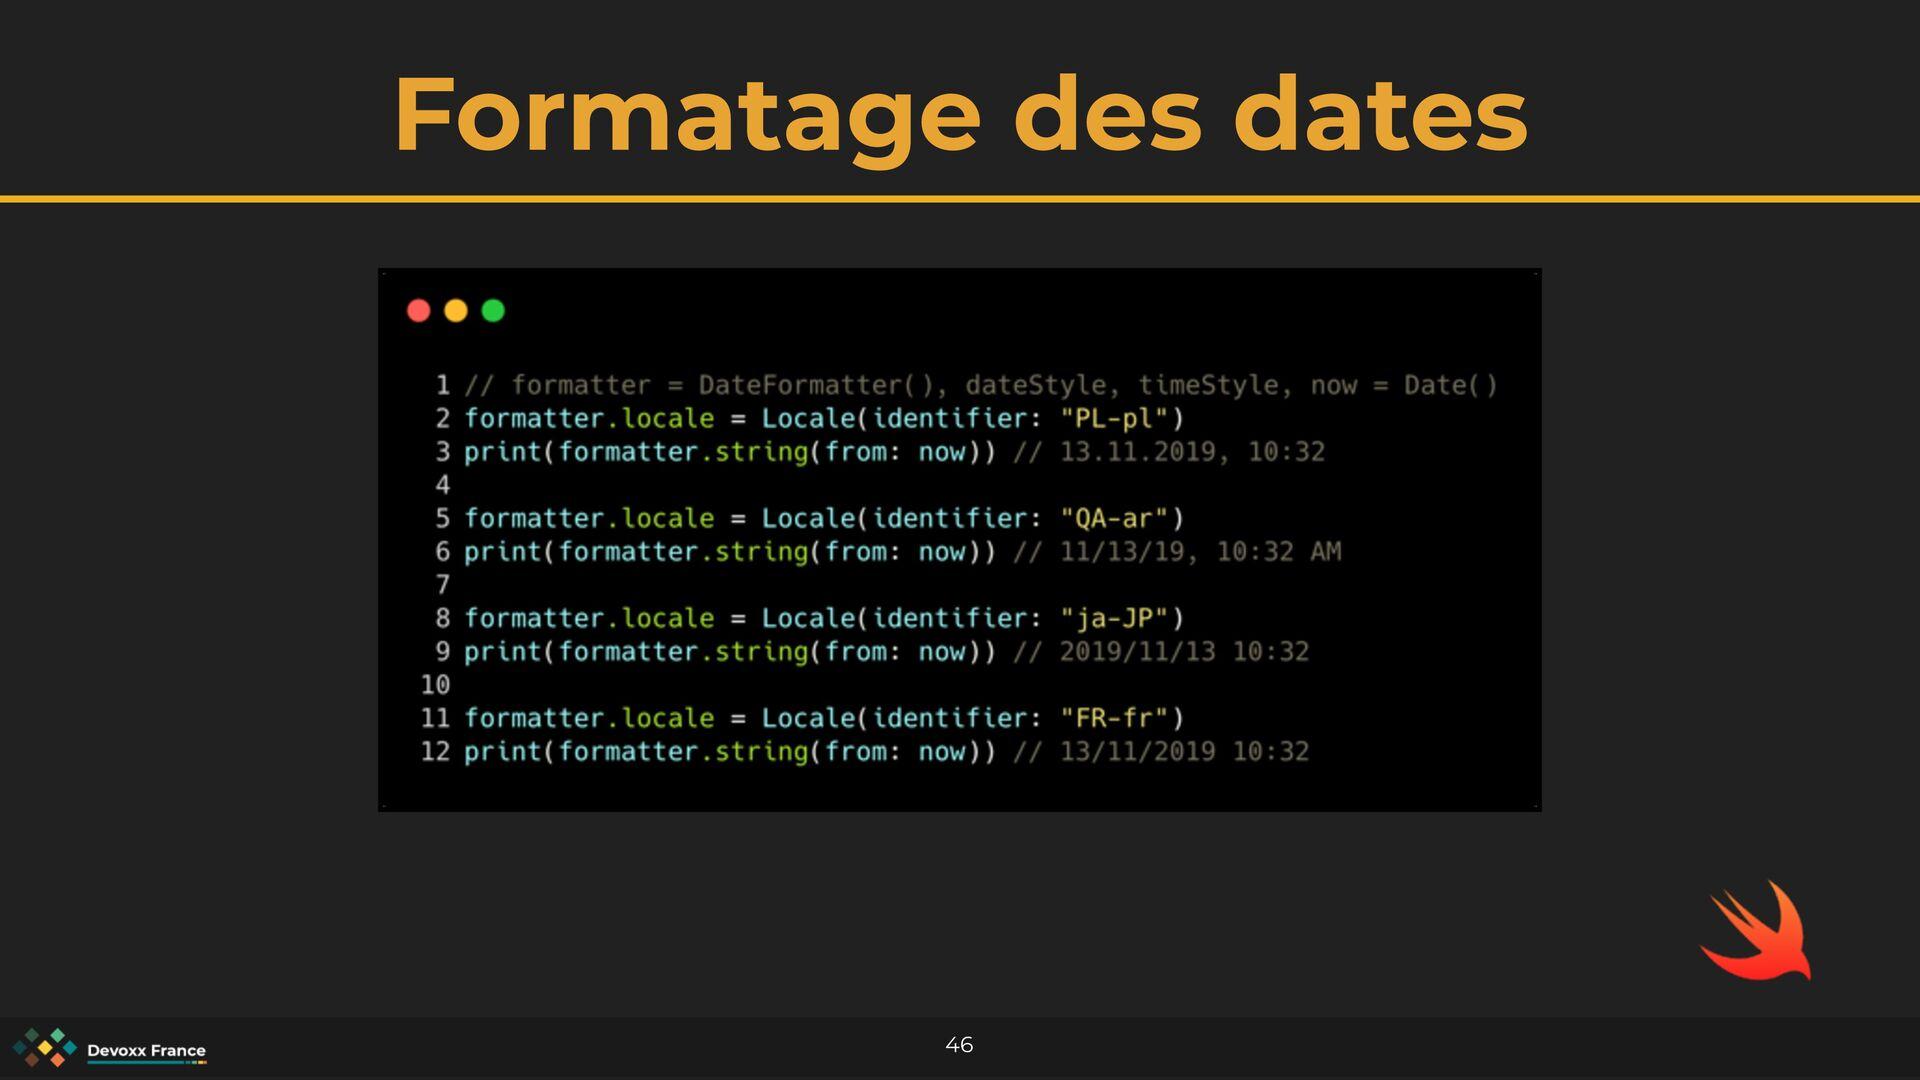 Formatage des dates 46